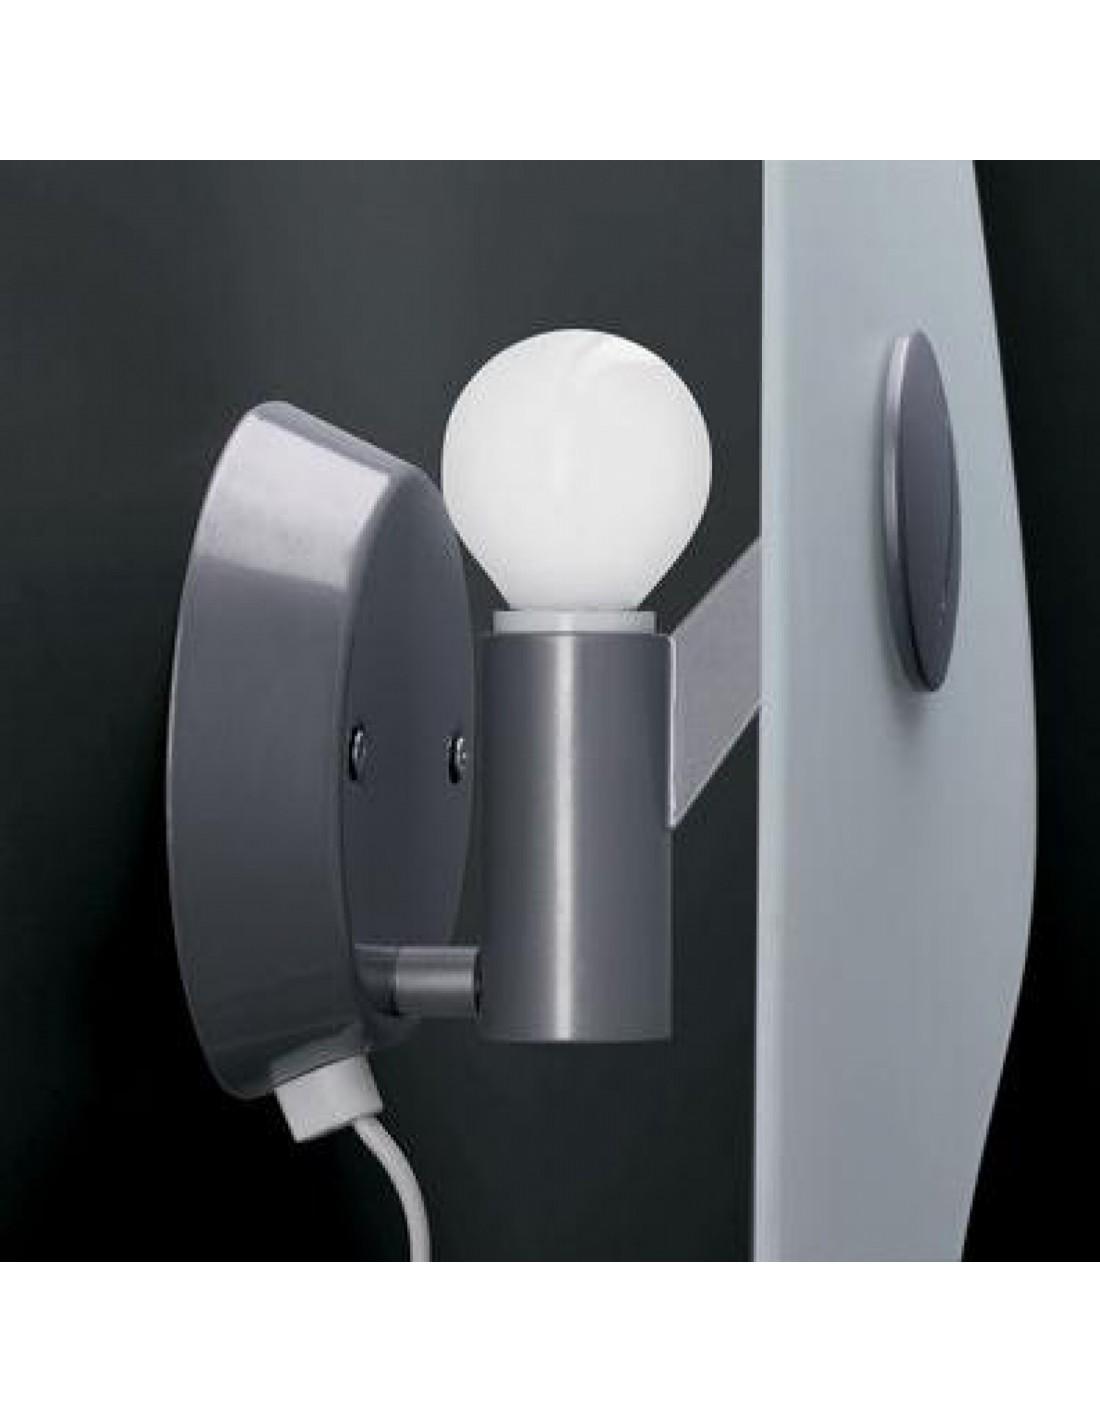 Ampoule de l'applique murale bit 2 de Ferruccio Laviani pour la marque Foscarini chez Valente Design